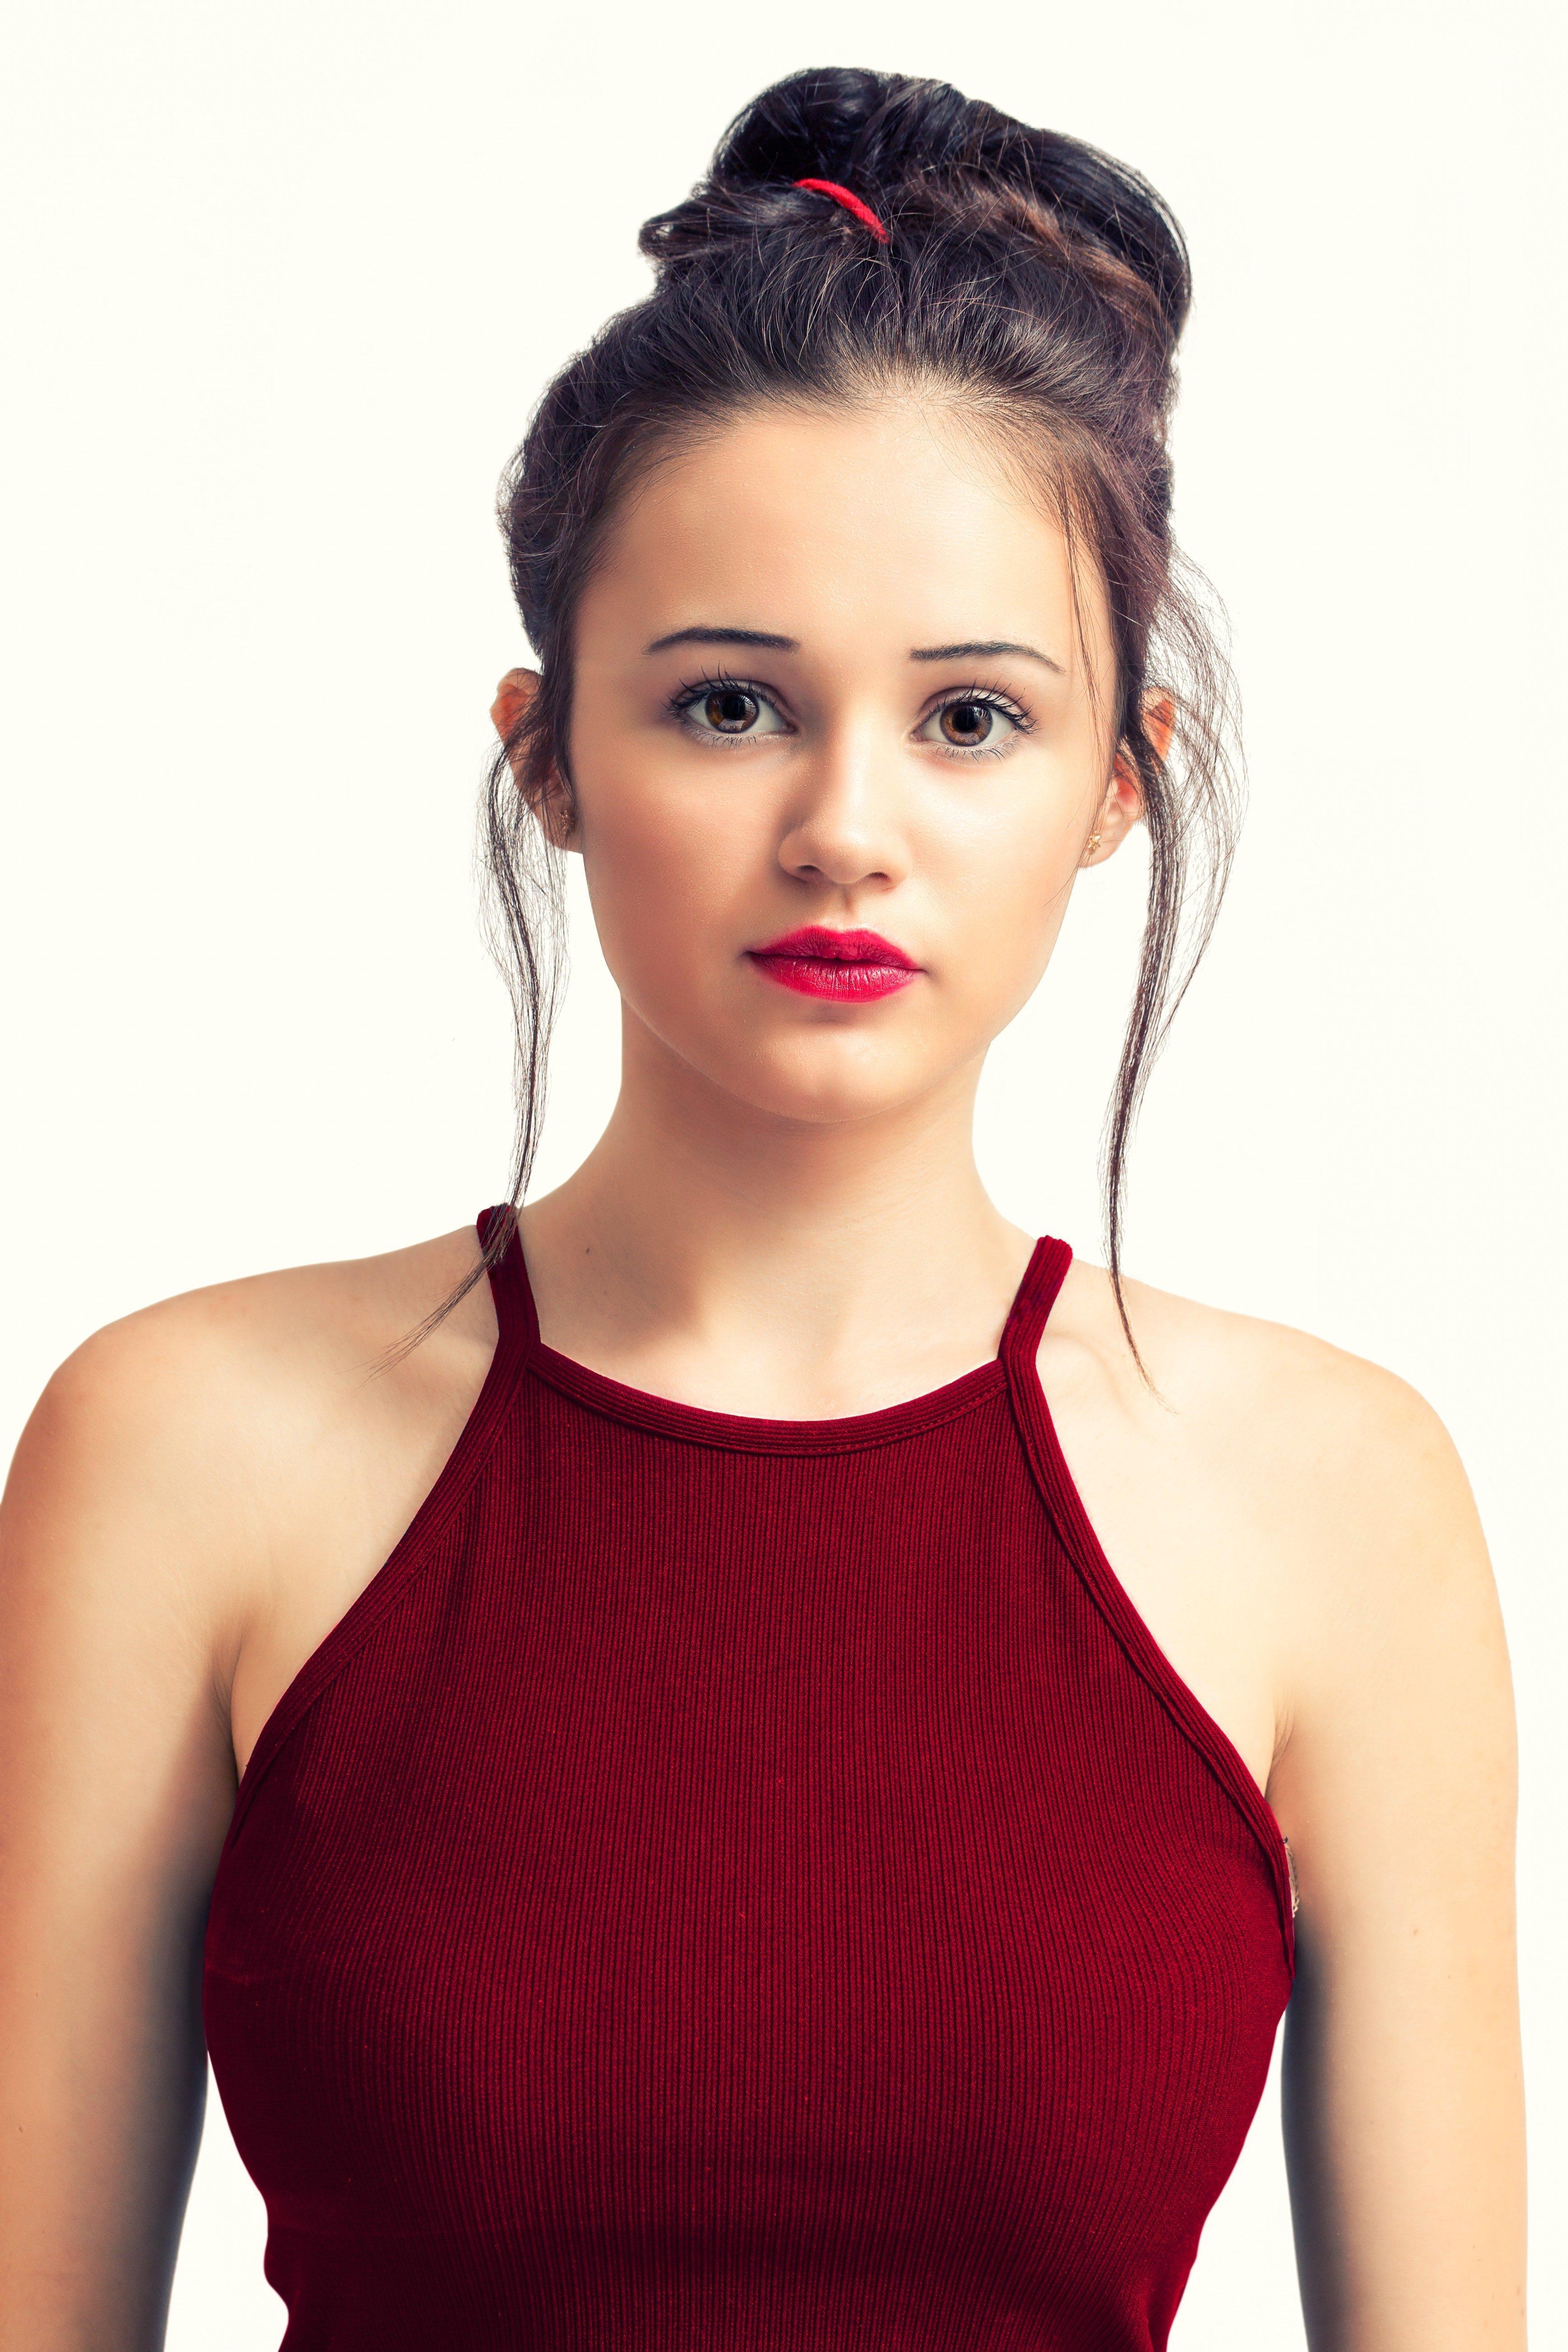 Une jeune femme en rouge. | Source : Pexels